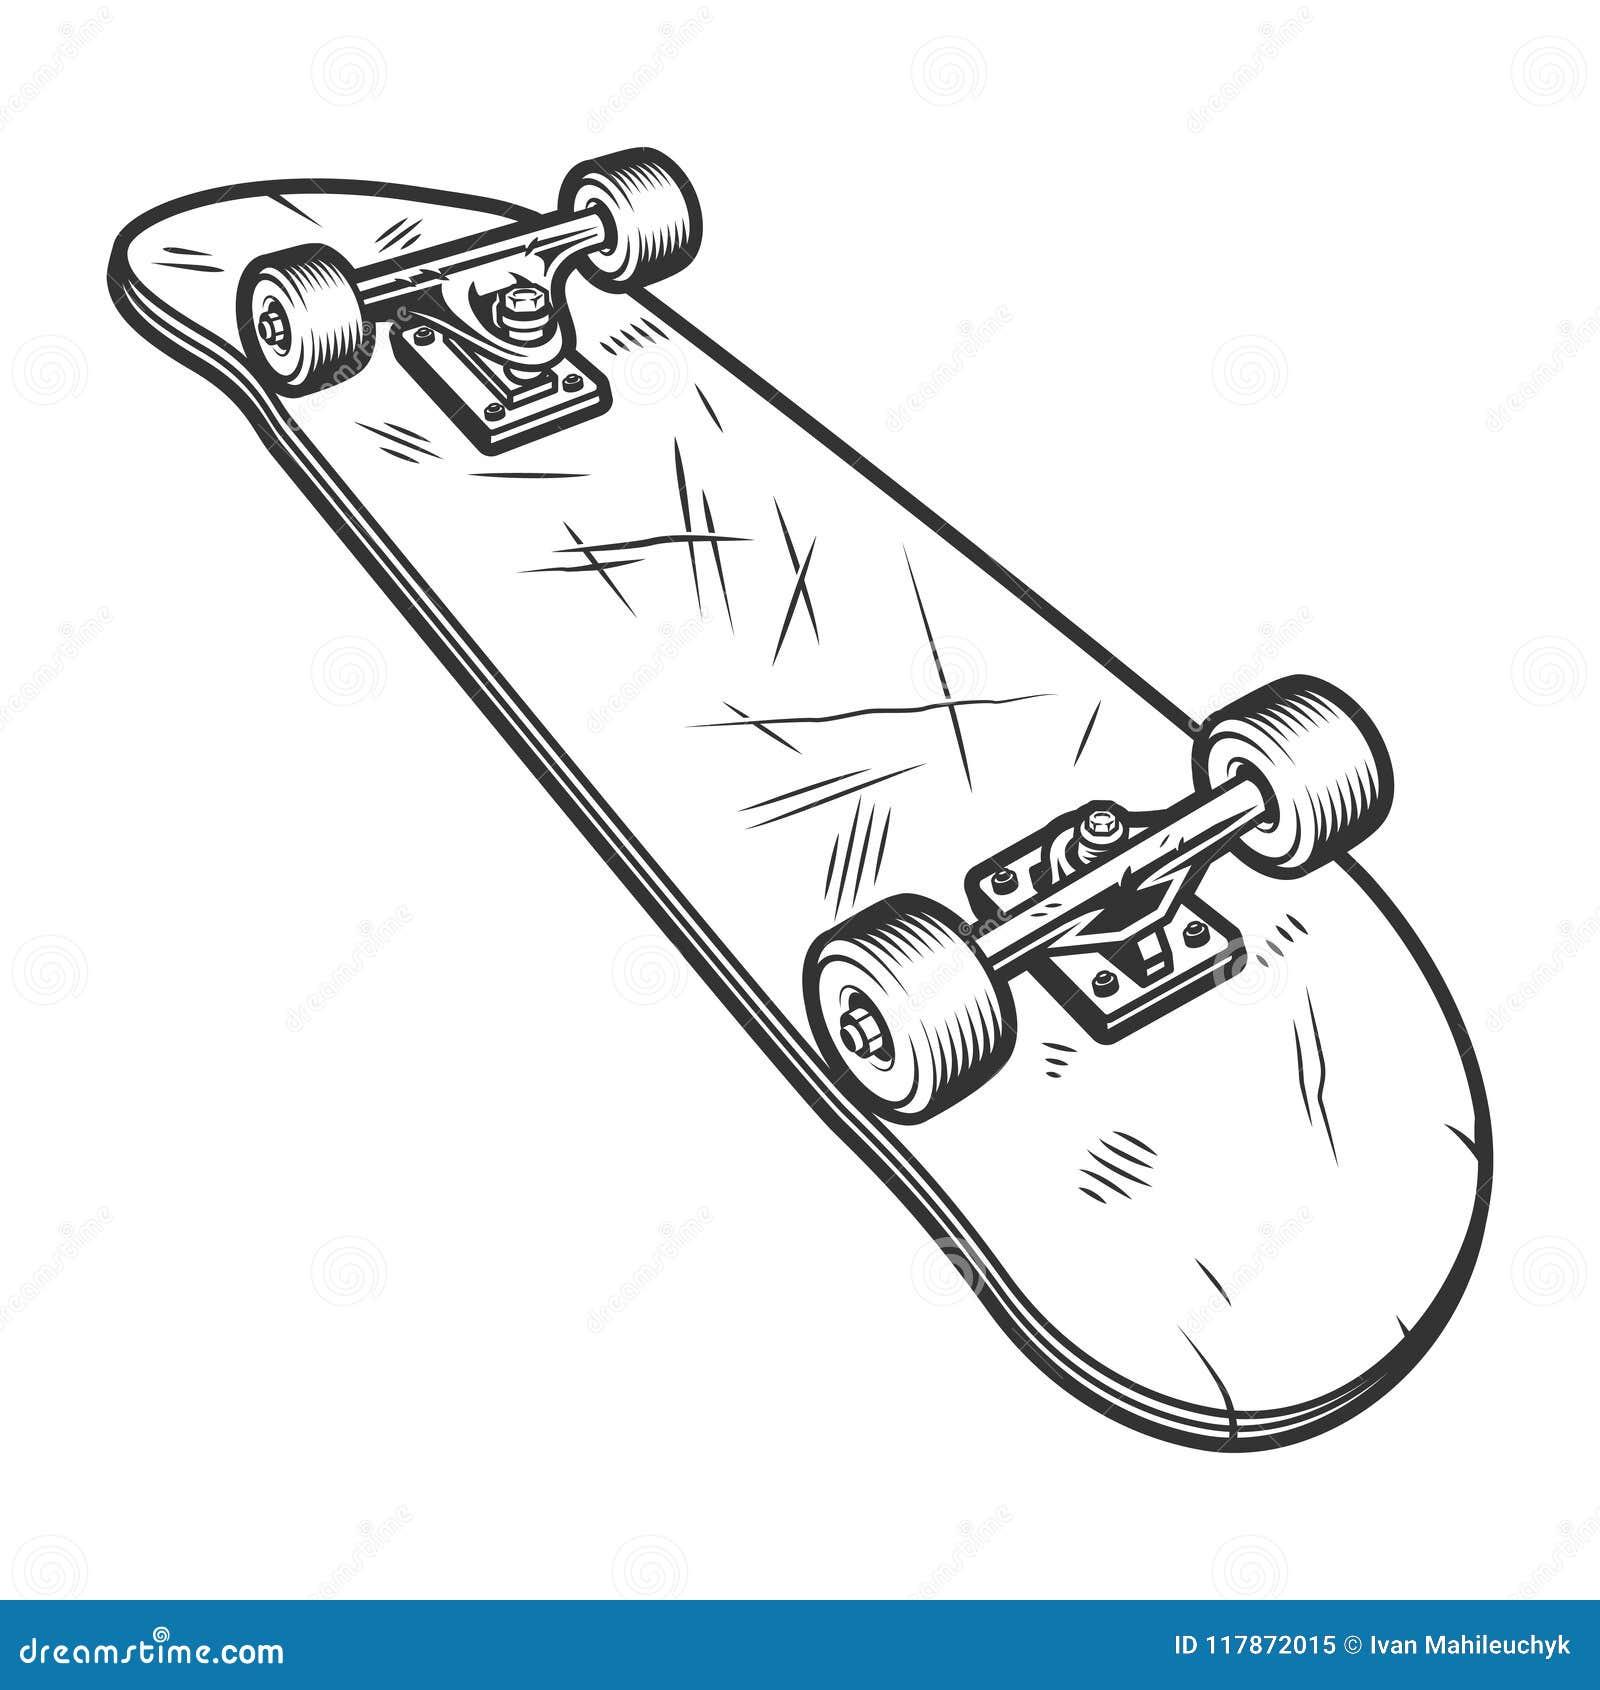 vintage monochrome inverted skateboard template stock vector